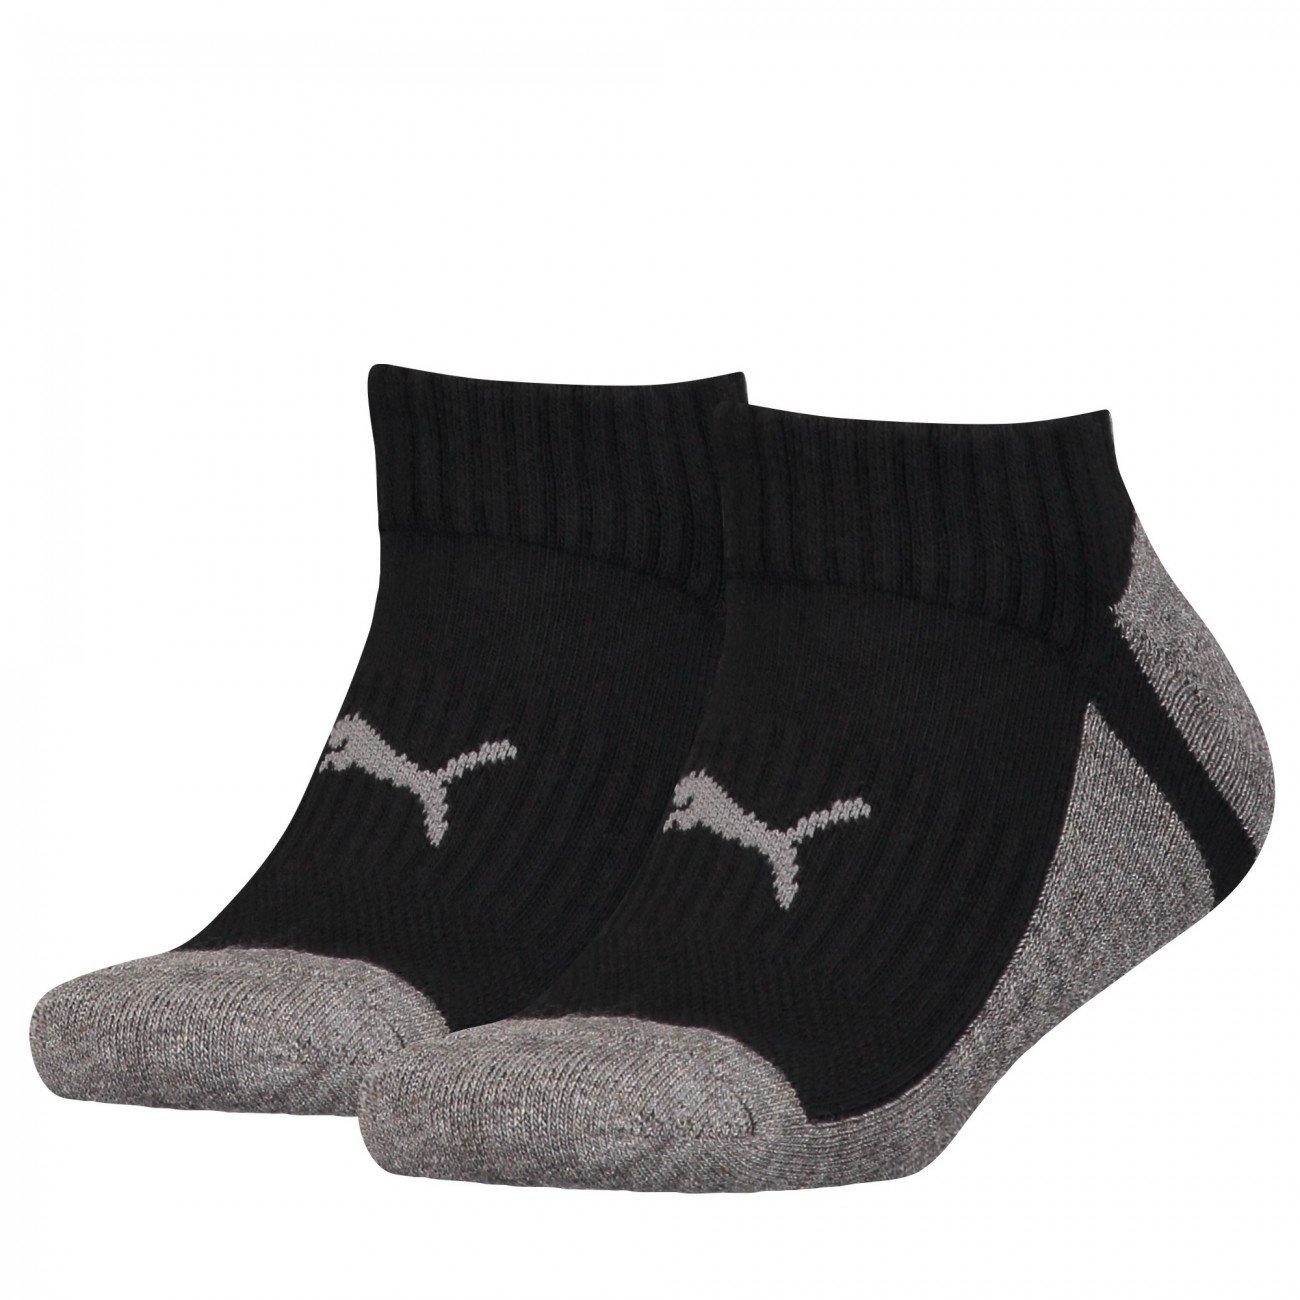 Puma Sneaker Multi-Sport 2P Kids Calcetines, Middle Grey Melange, 31–34 31-34 184005001